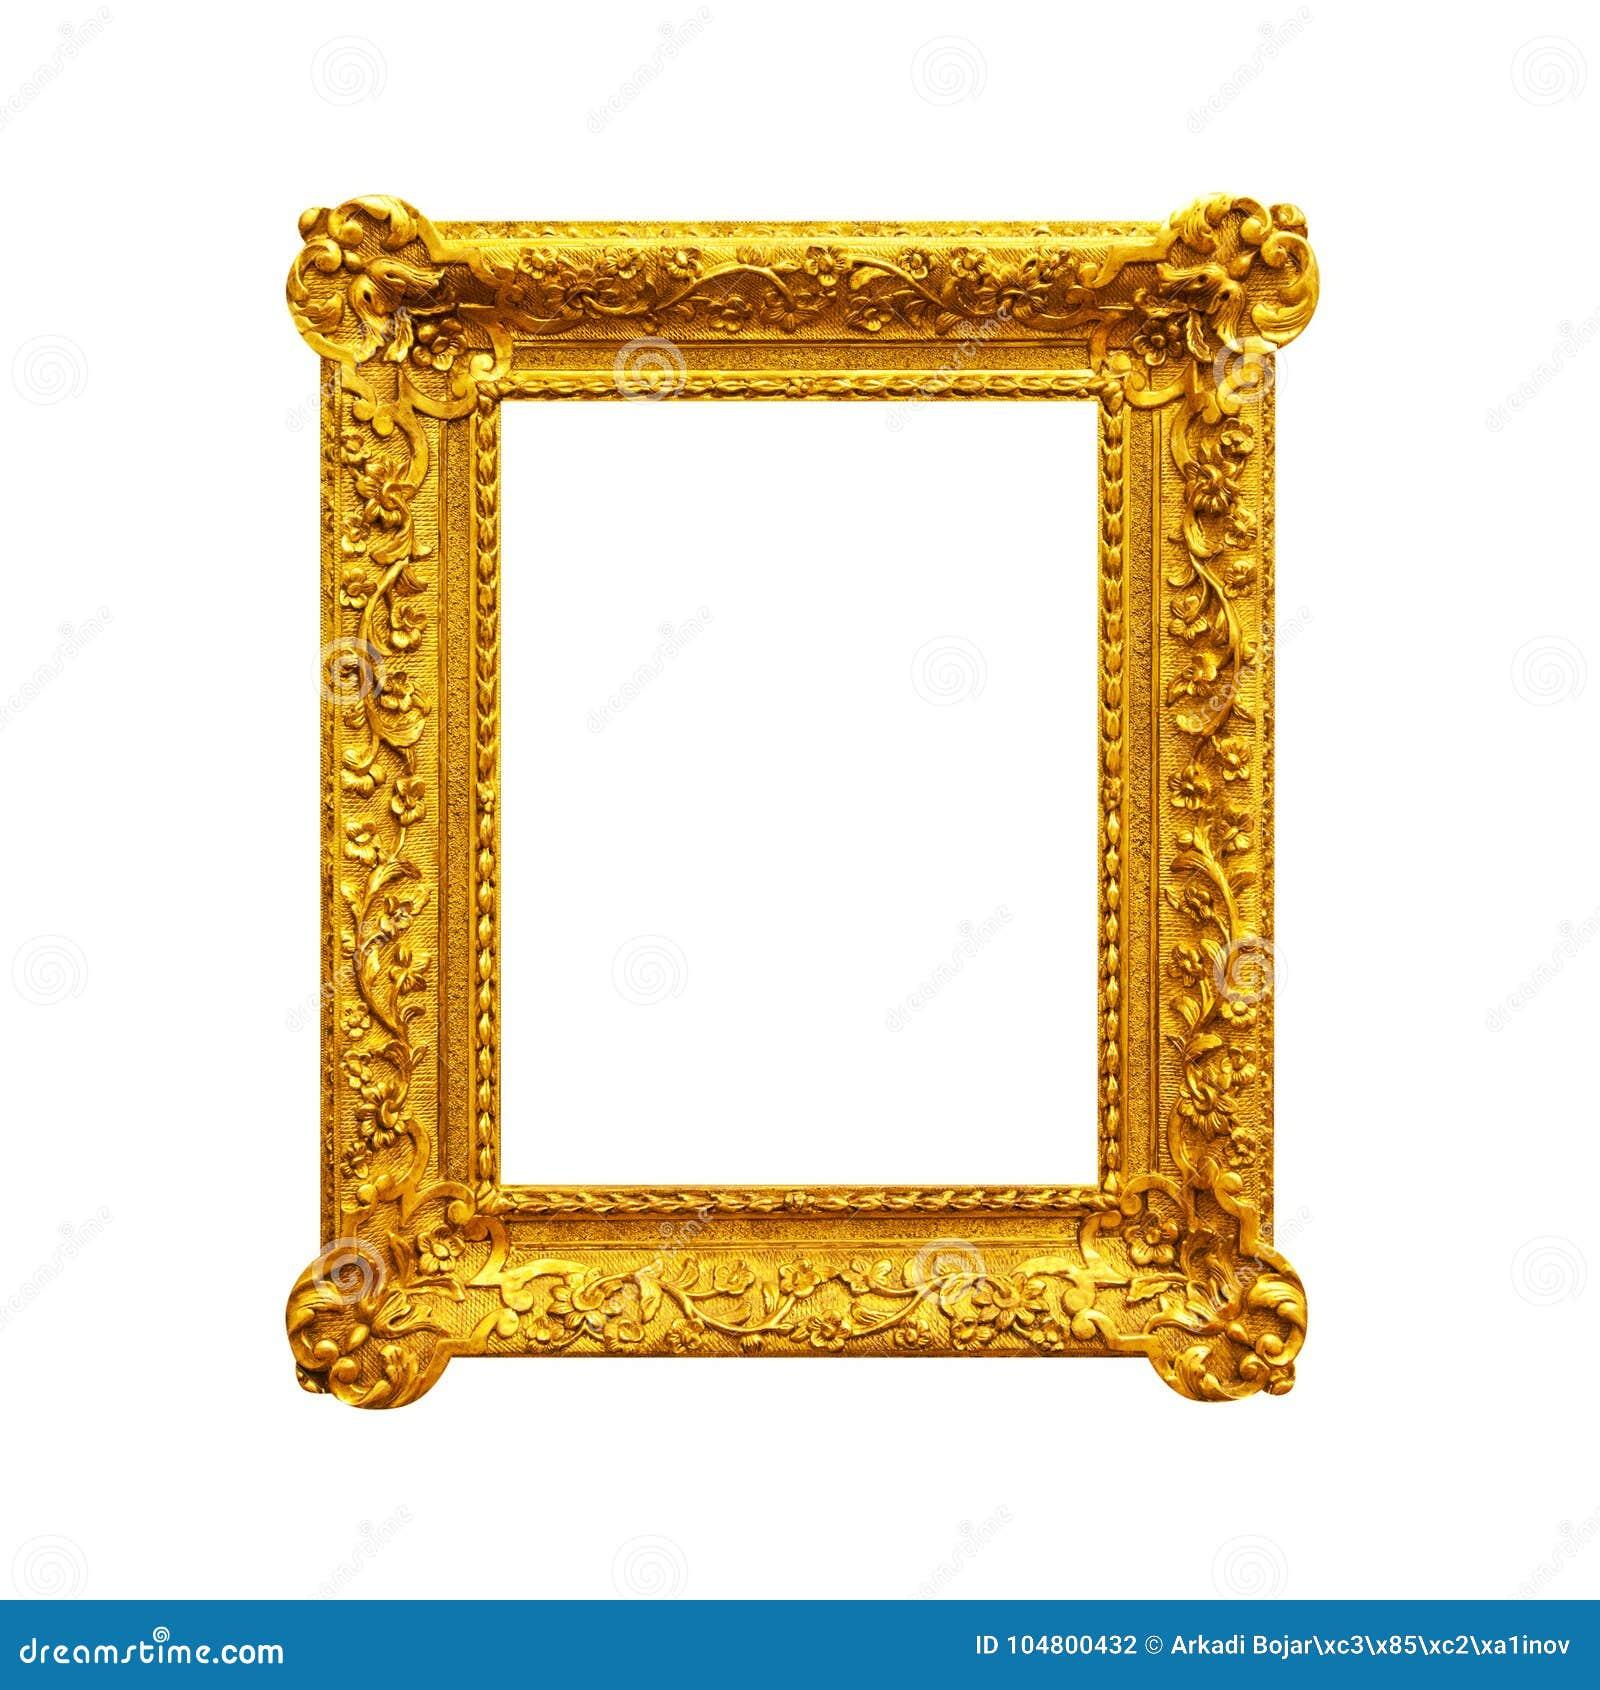 ea30c25a8c48 Vintage Ornate Frame Isolated On White Stock Photo - Image of ...